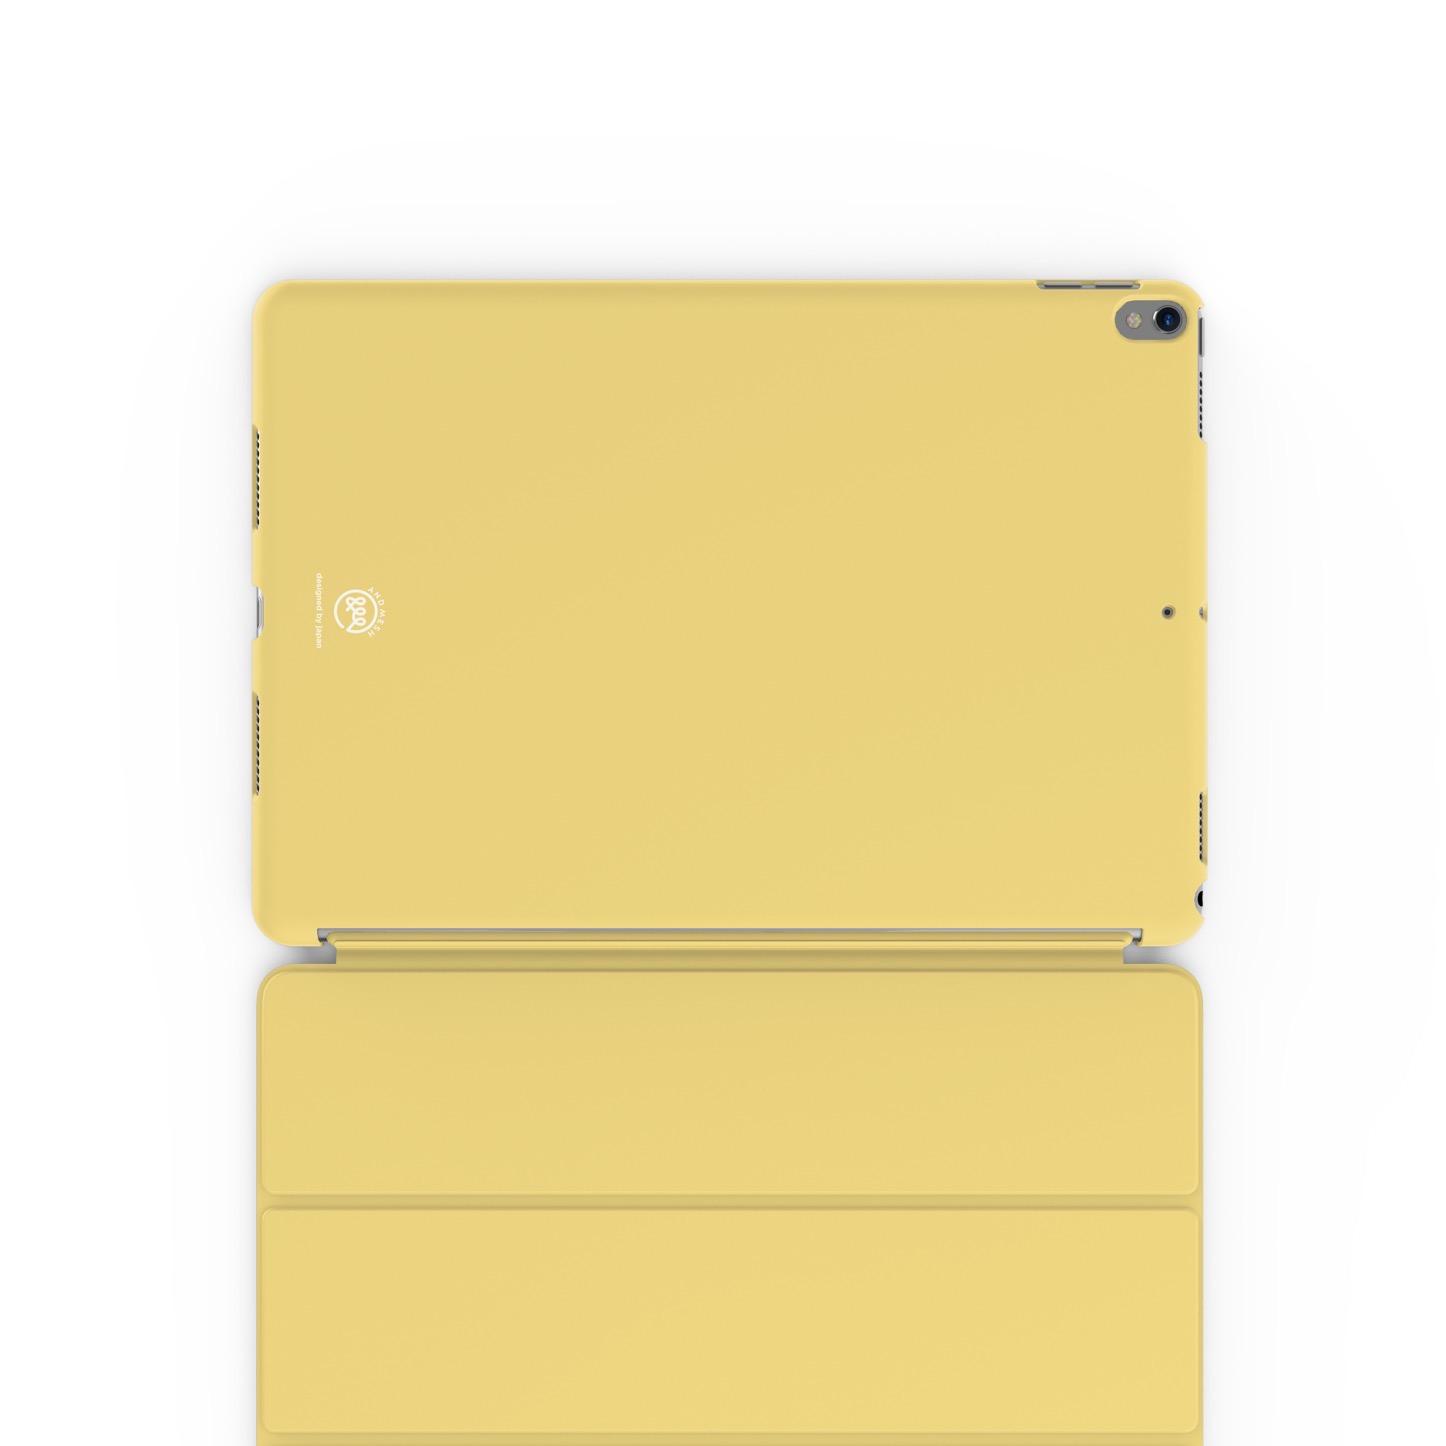 AndMesh-iPad-Pro-10_5-10.jpg